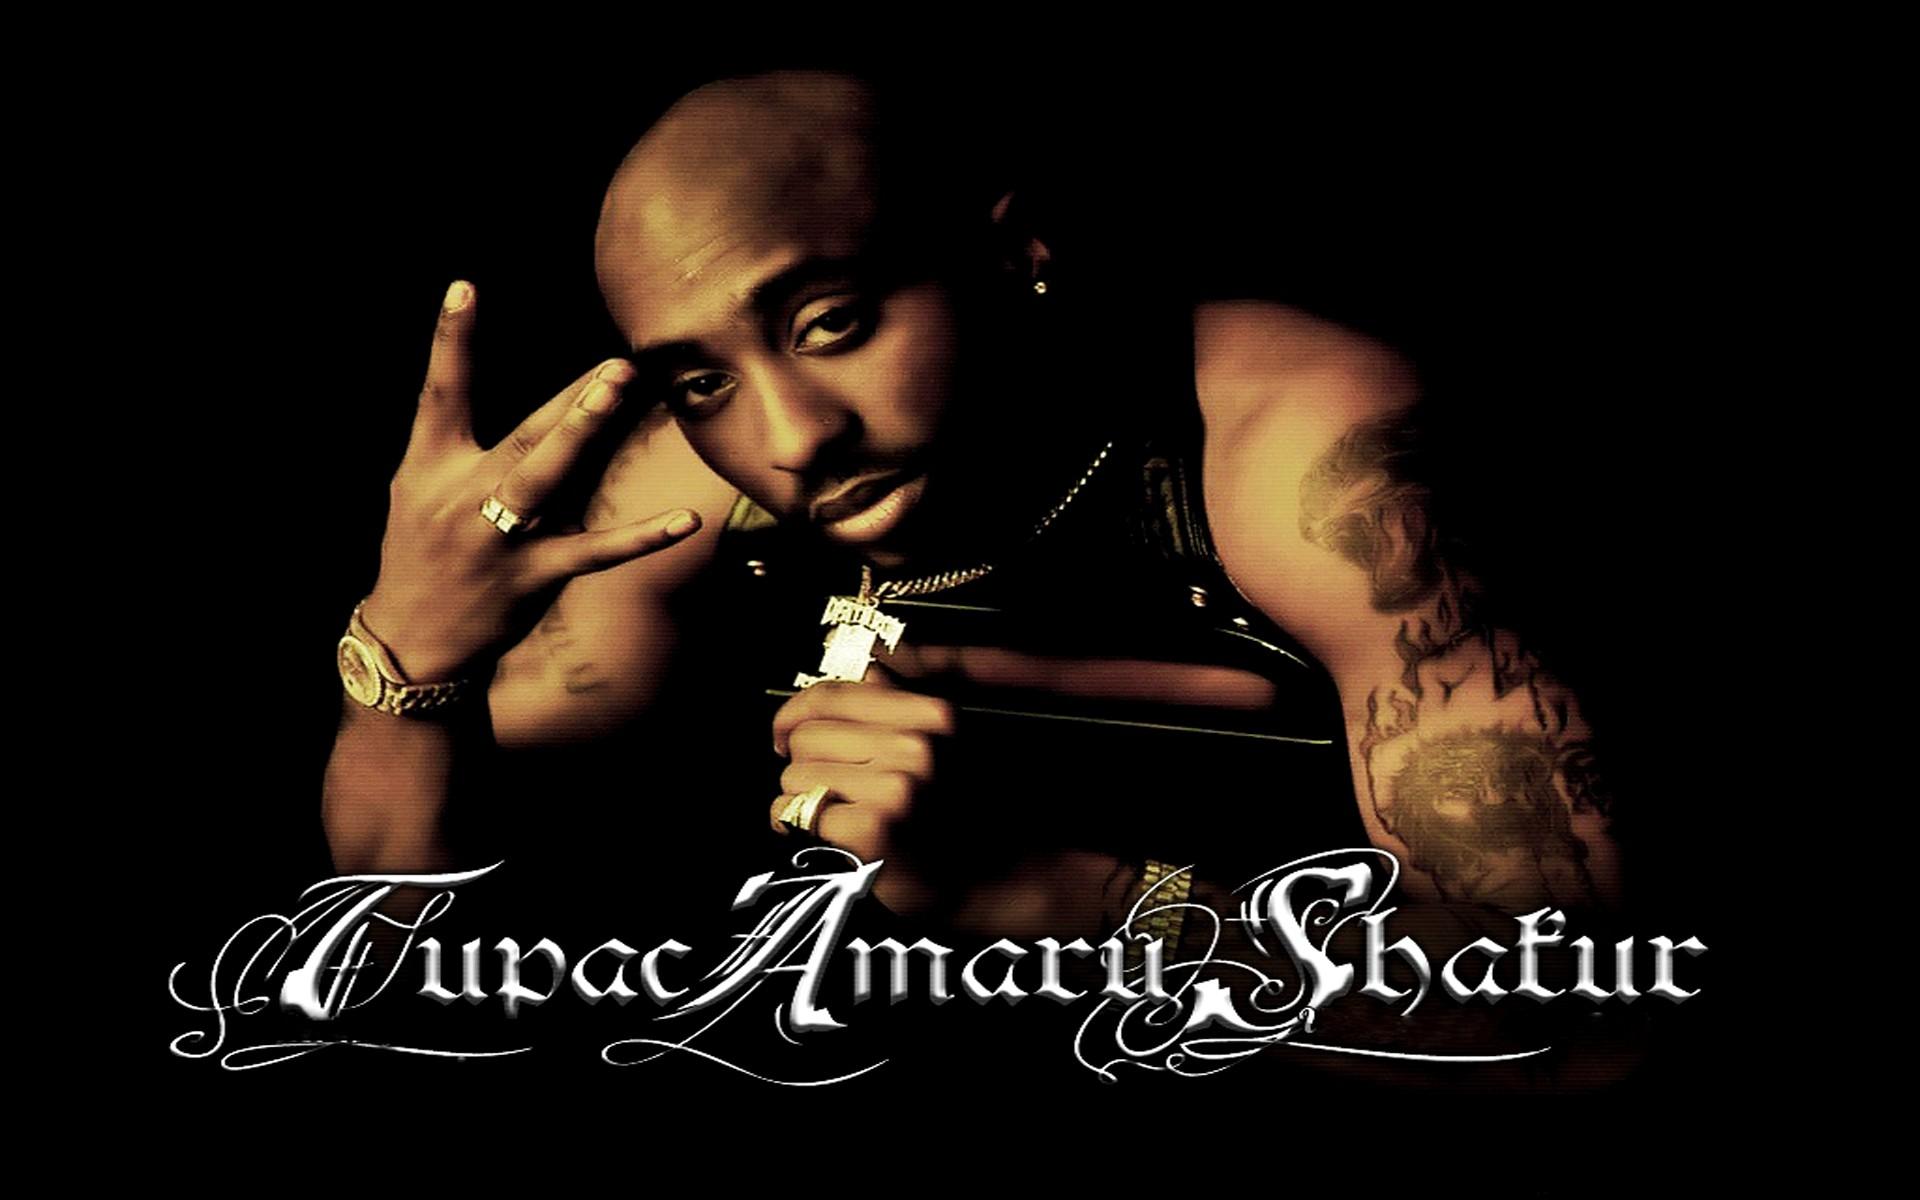 Tupac rap gangsta g wallpaper 1920x1200 45913 WallpaperUP 1920x1200